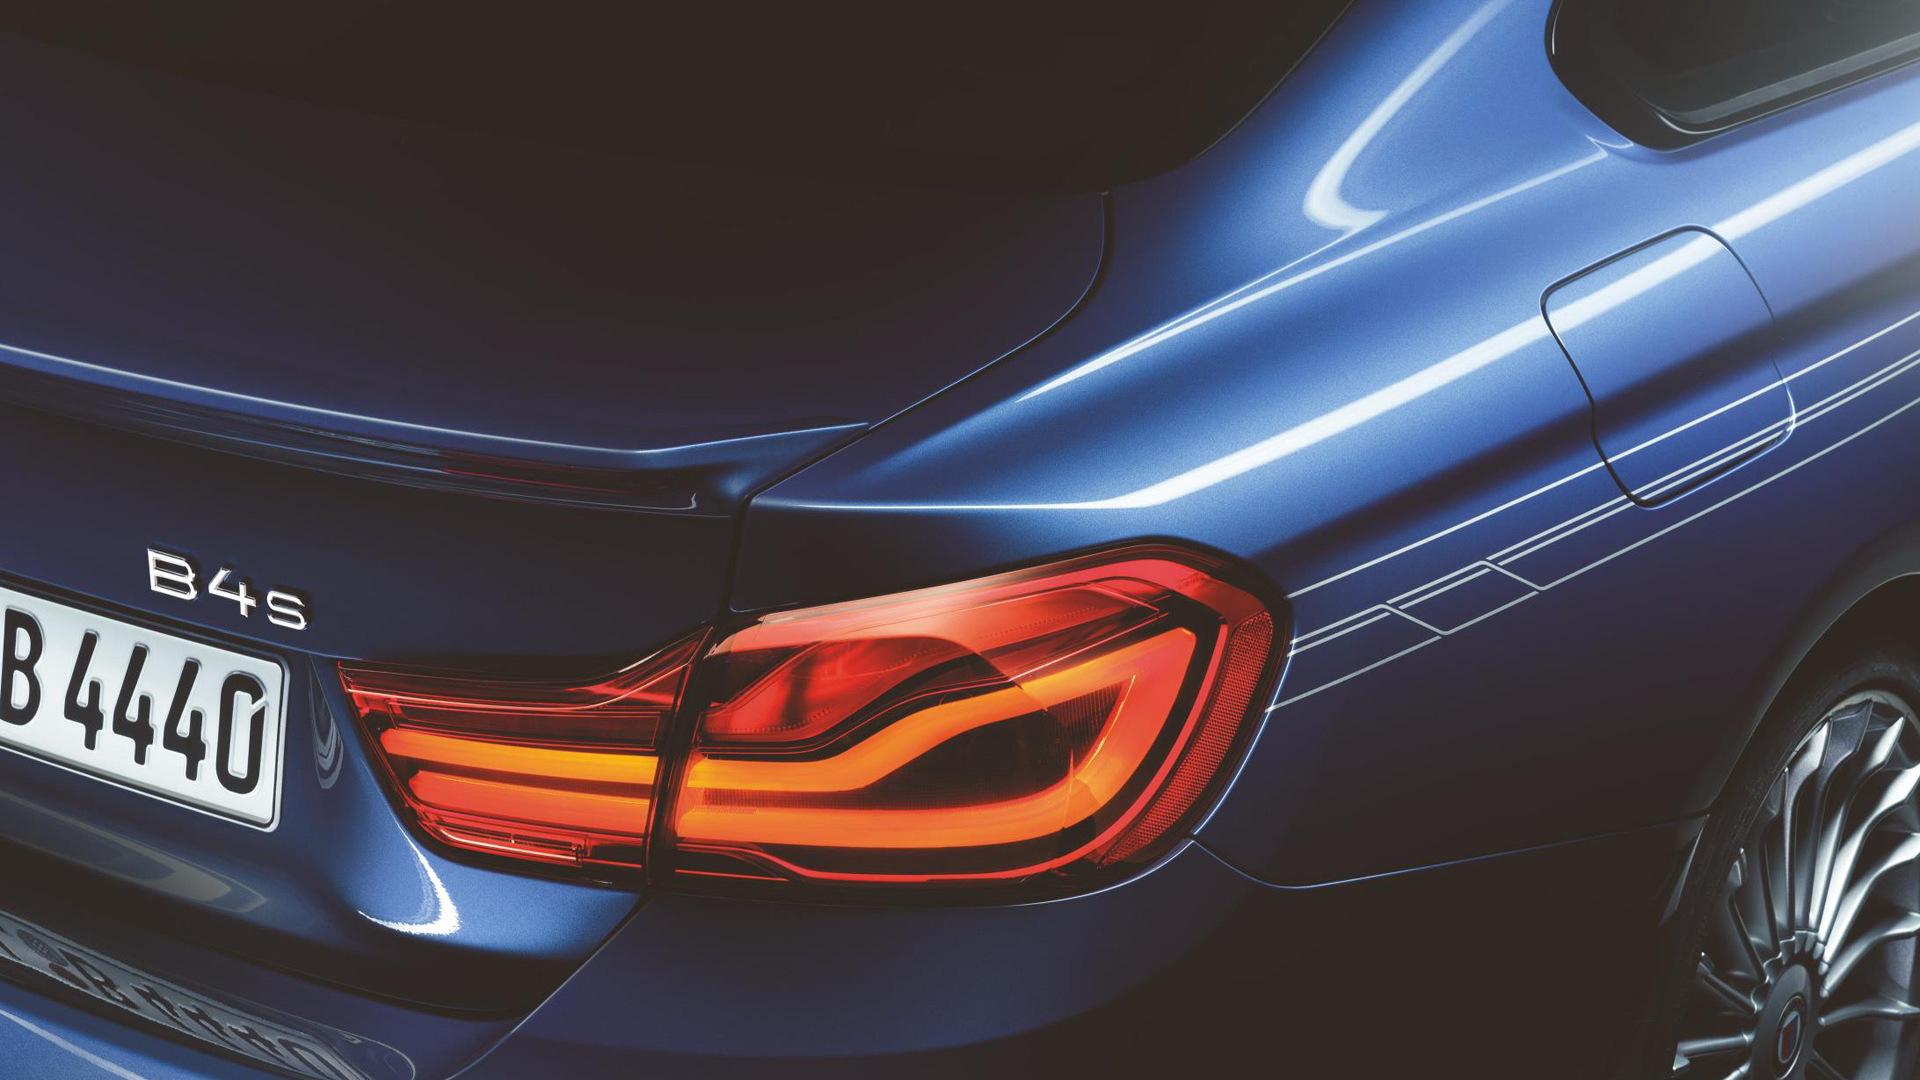 2018 BMW Alpina B4 S